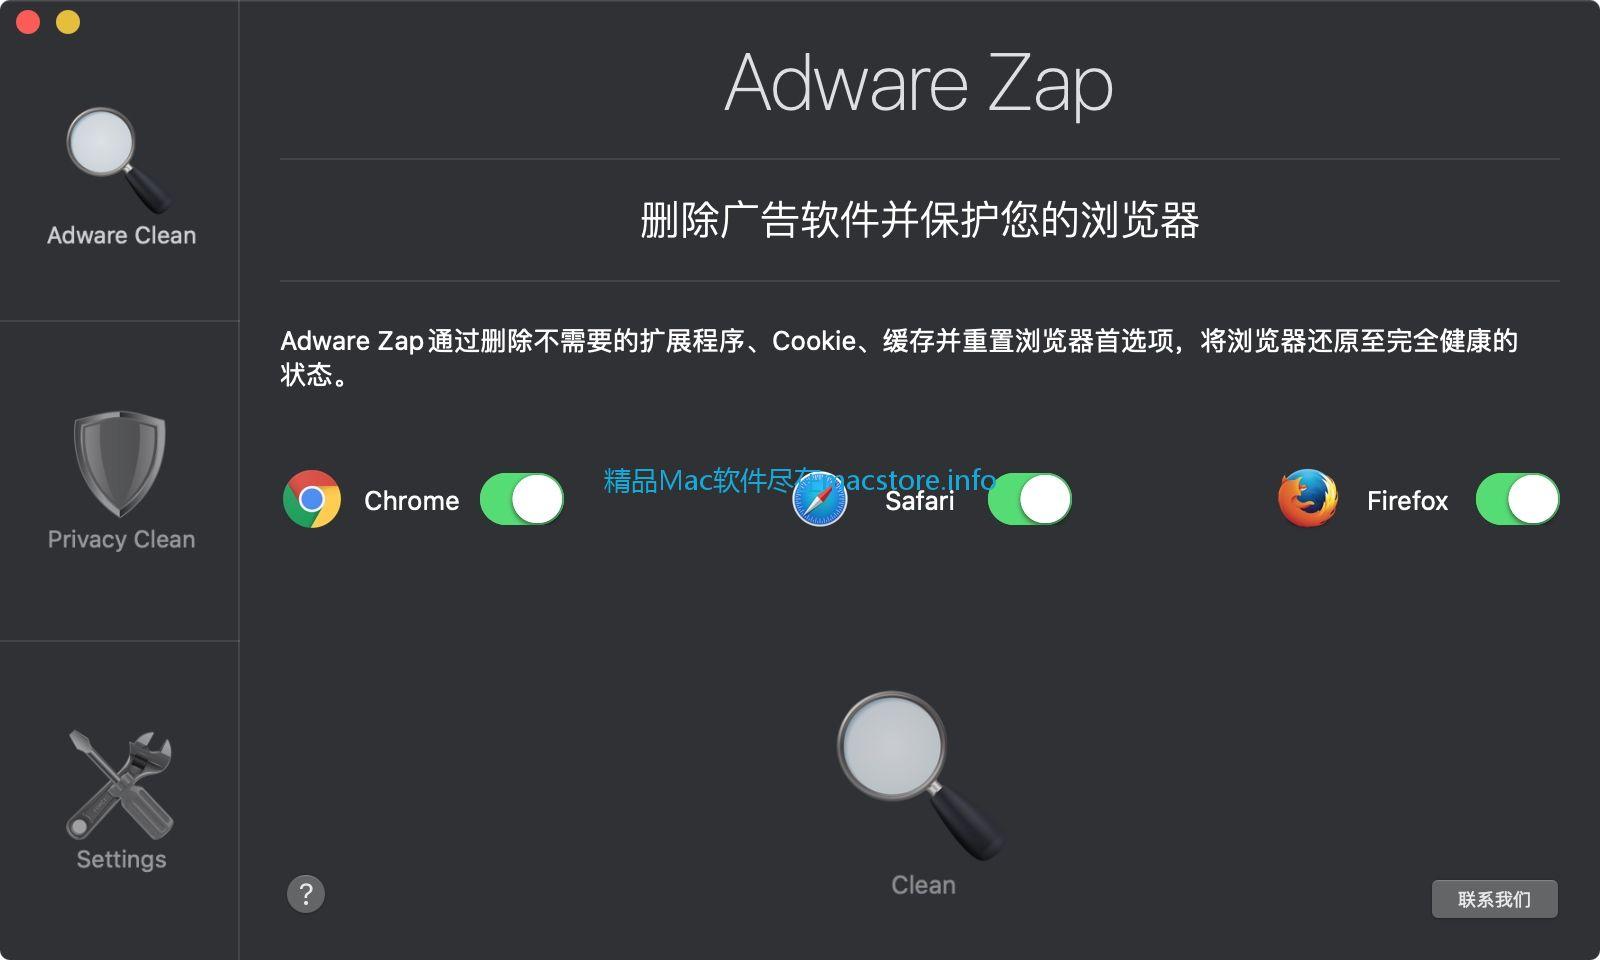 Adware Zap Pro保护您的浏览器中